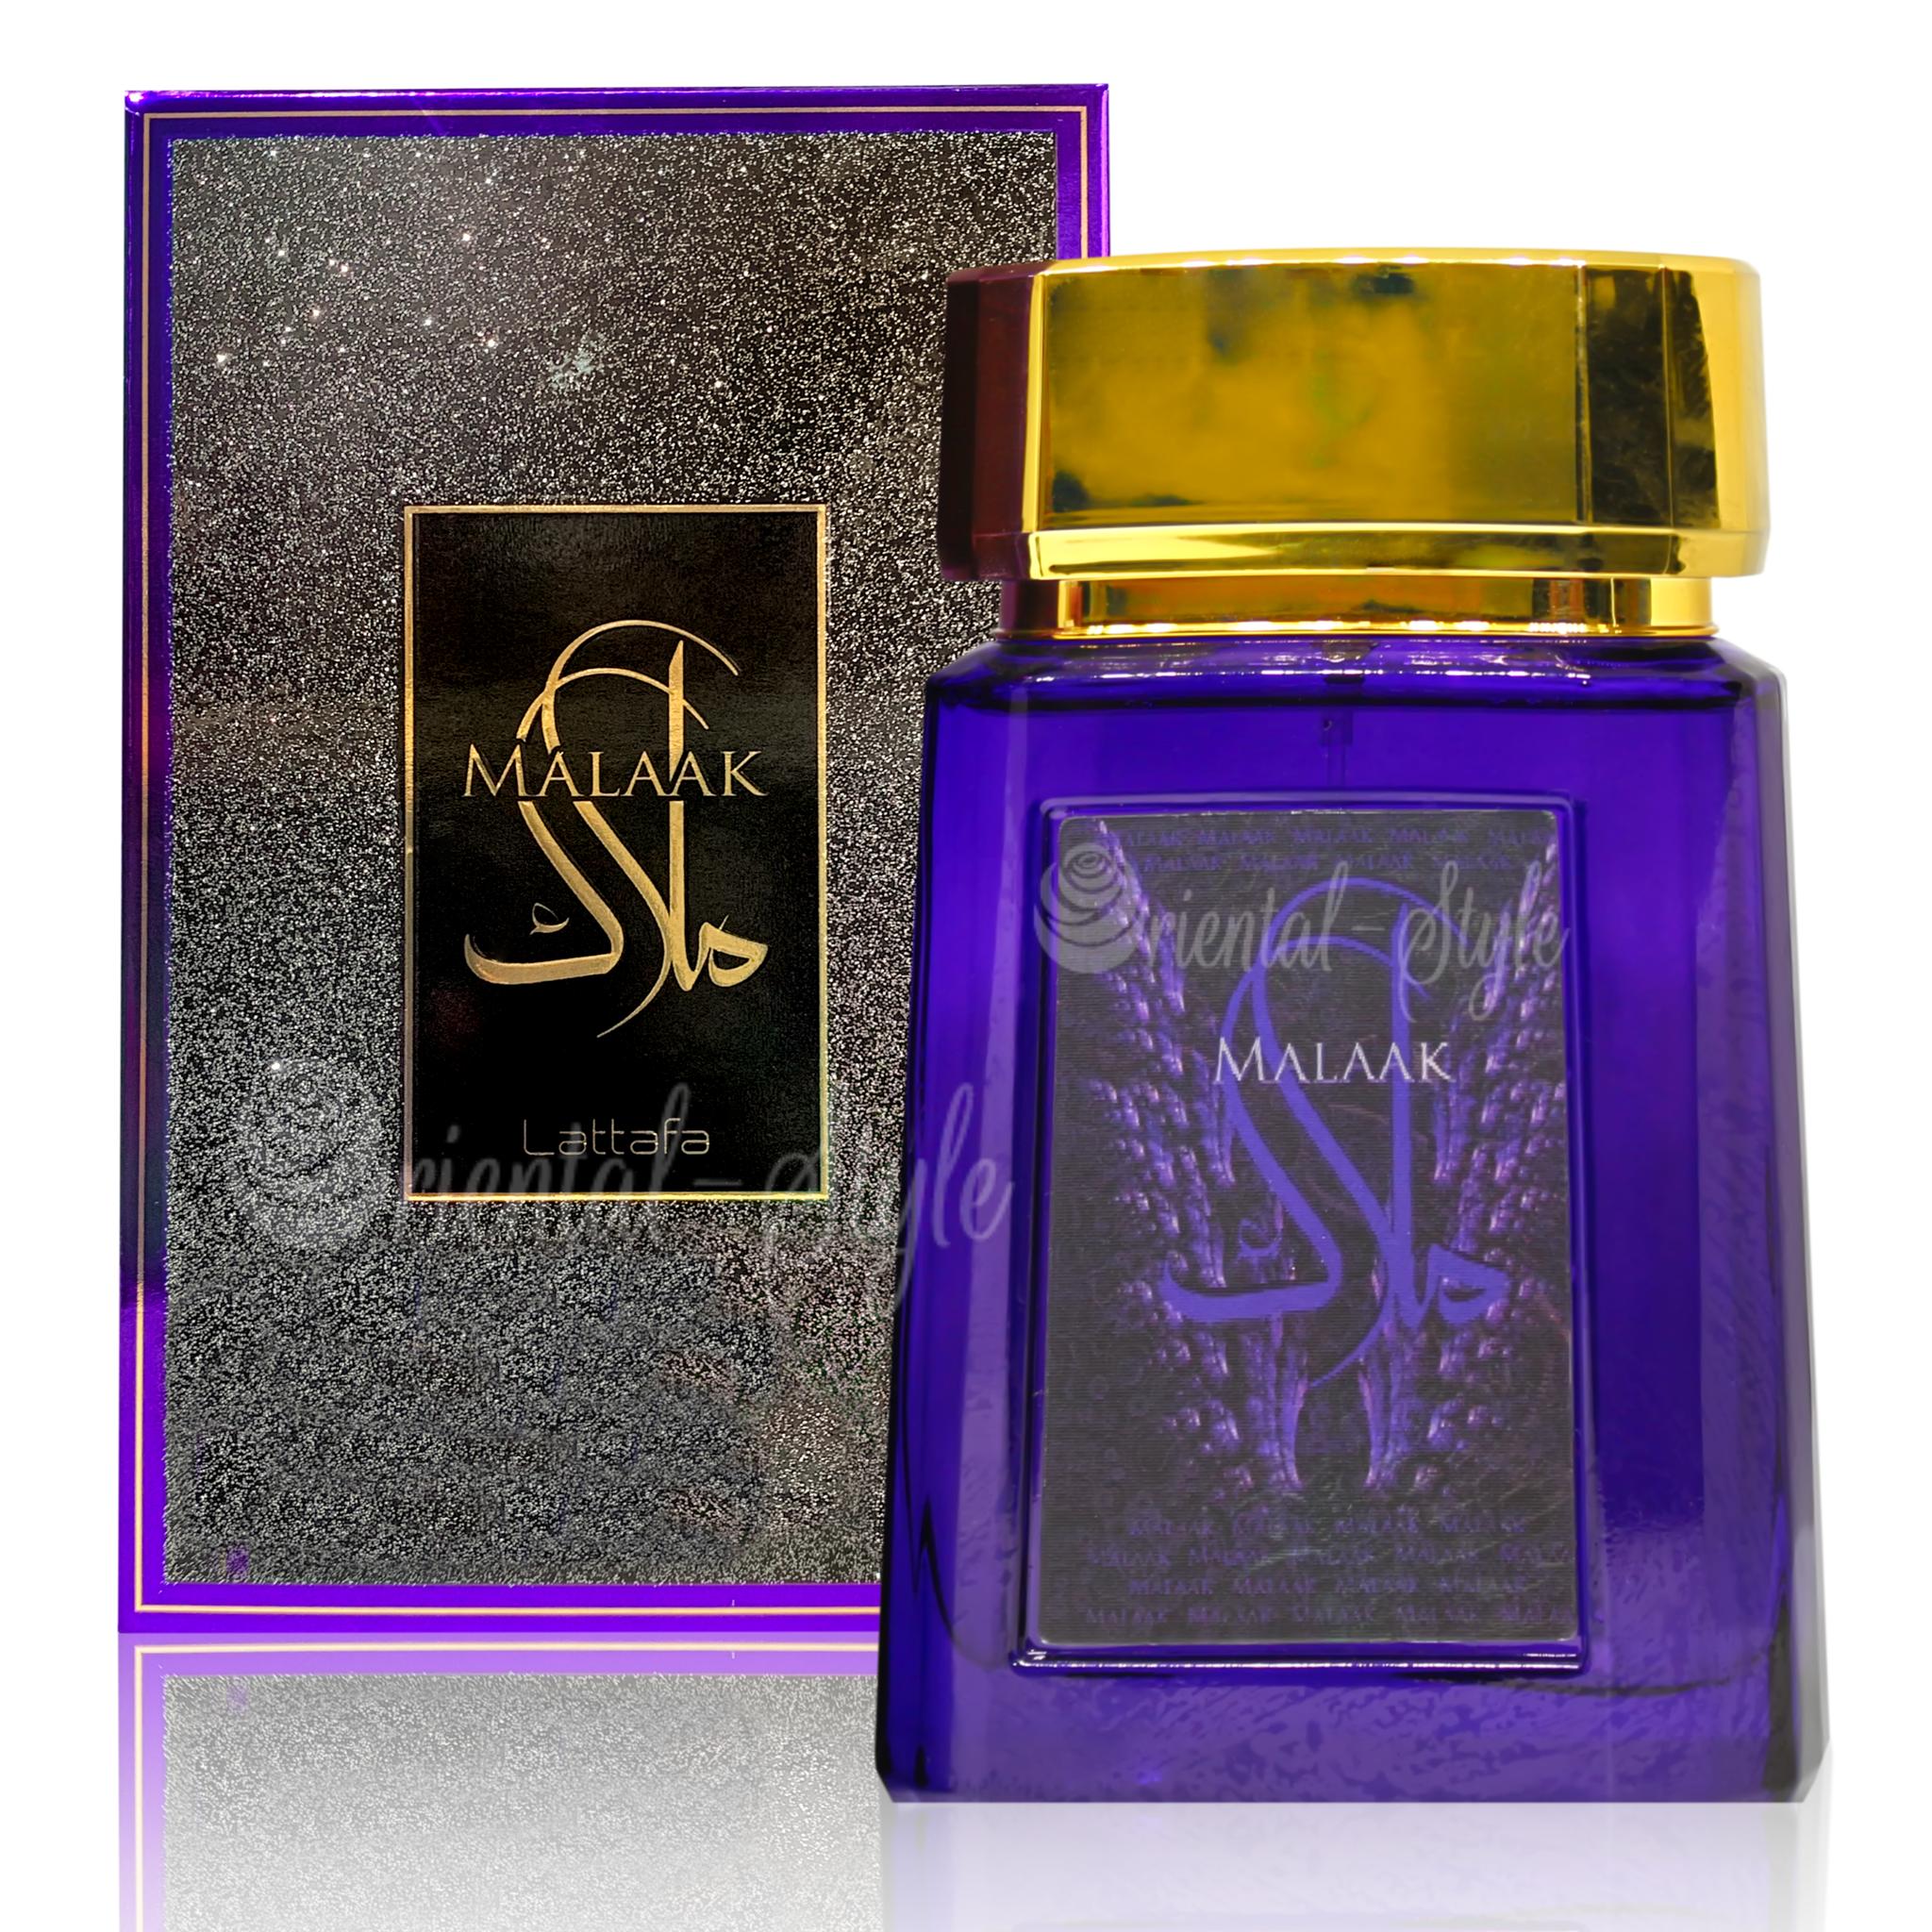 Parfüm Malaak Eau de Parfum von Lattafa